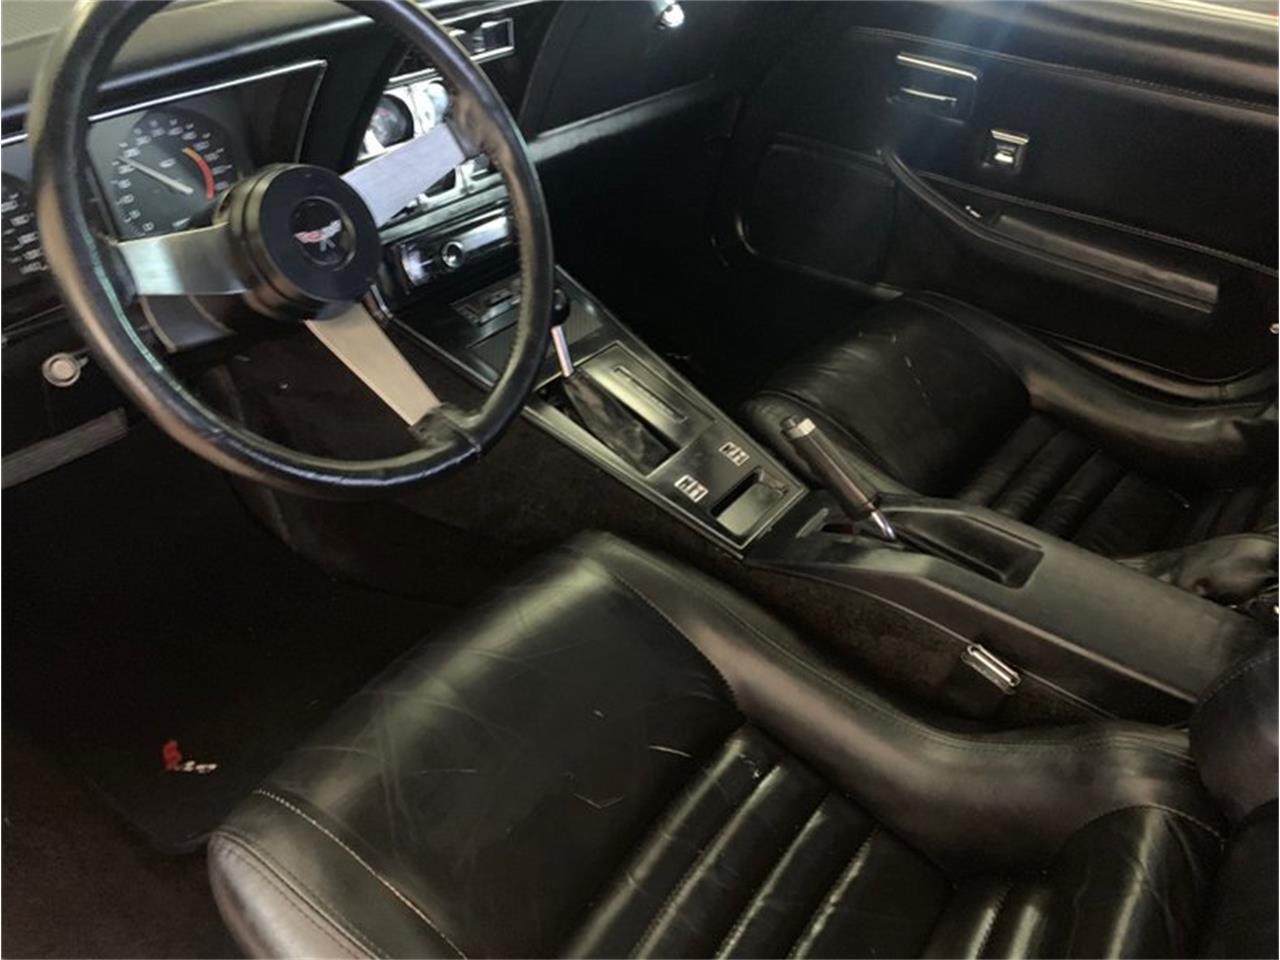 1979 Chevrolet Corvette (CC-1352051) for sale in Punta Gorda, Florida